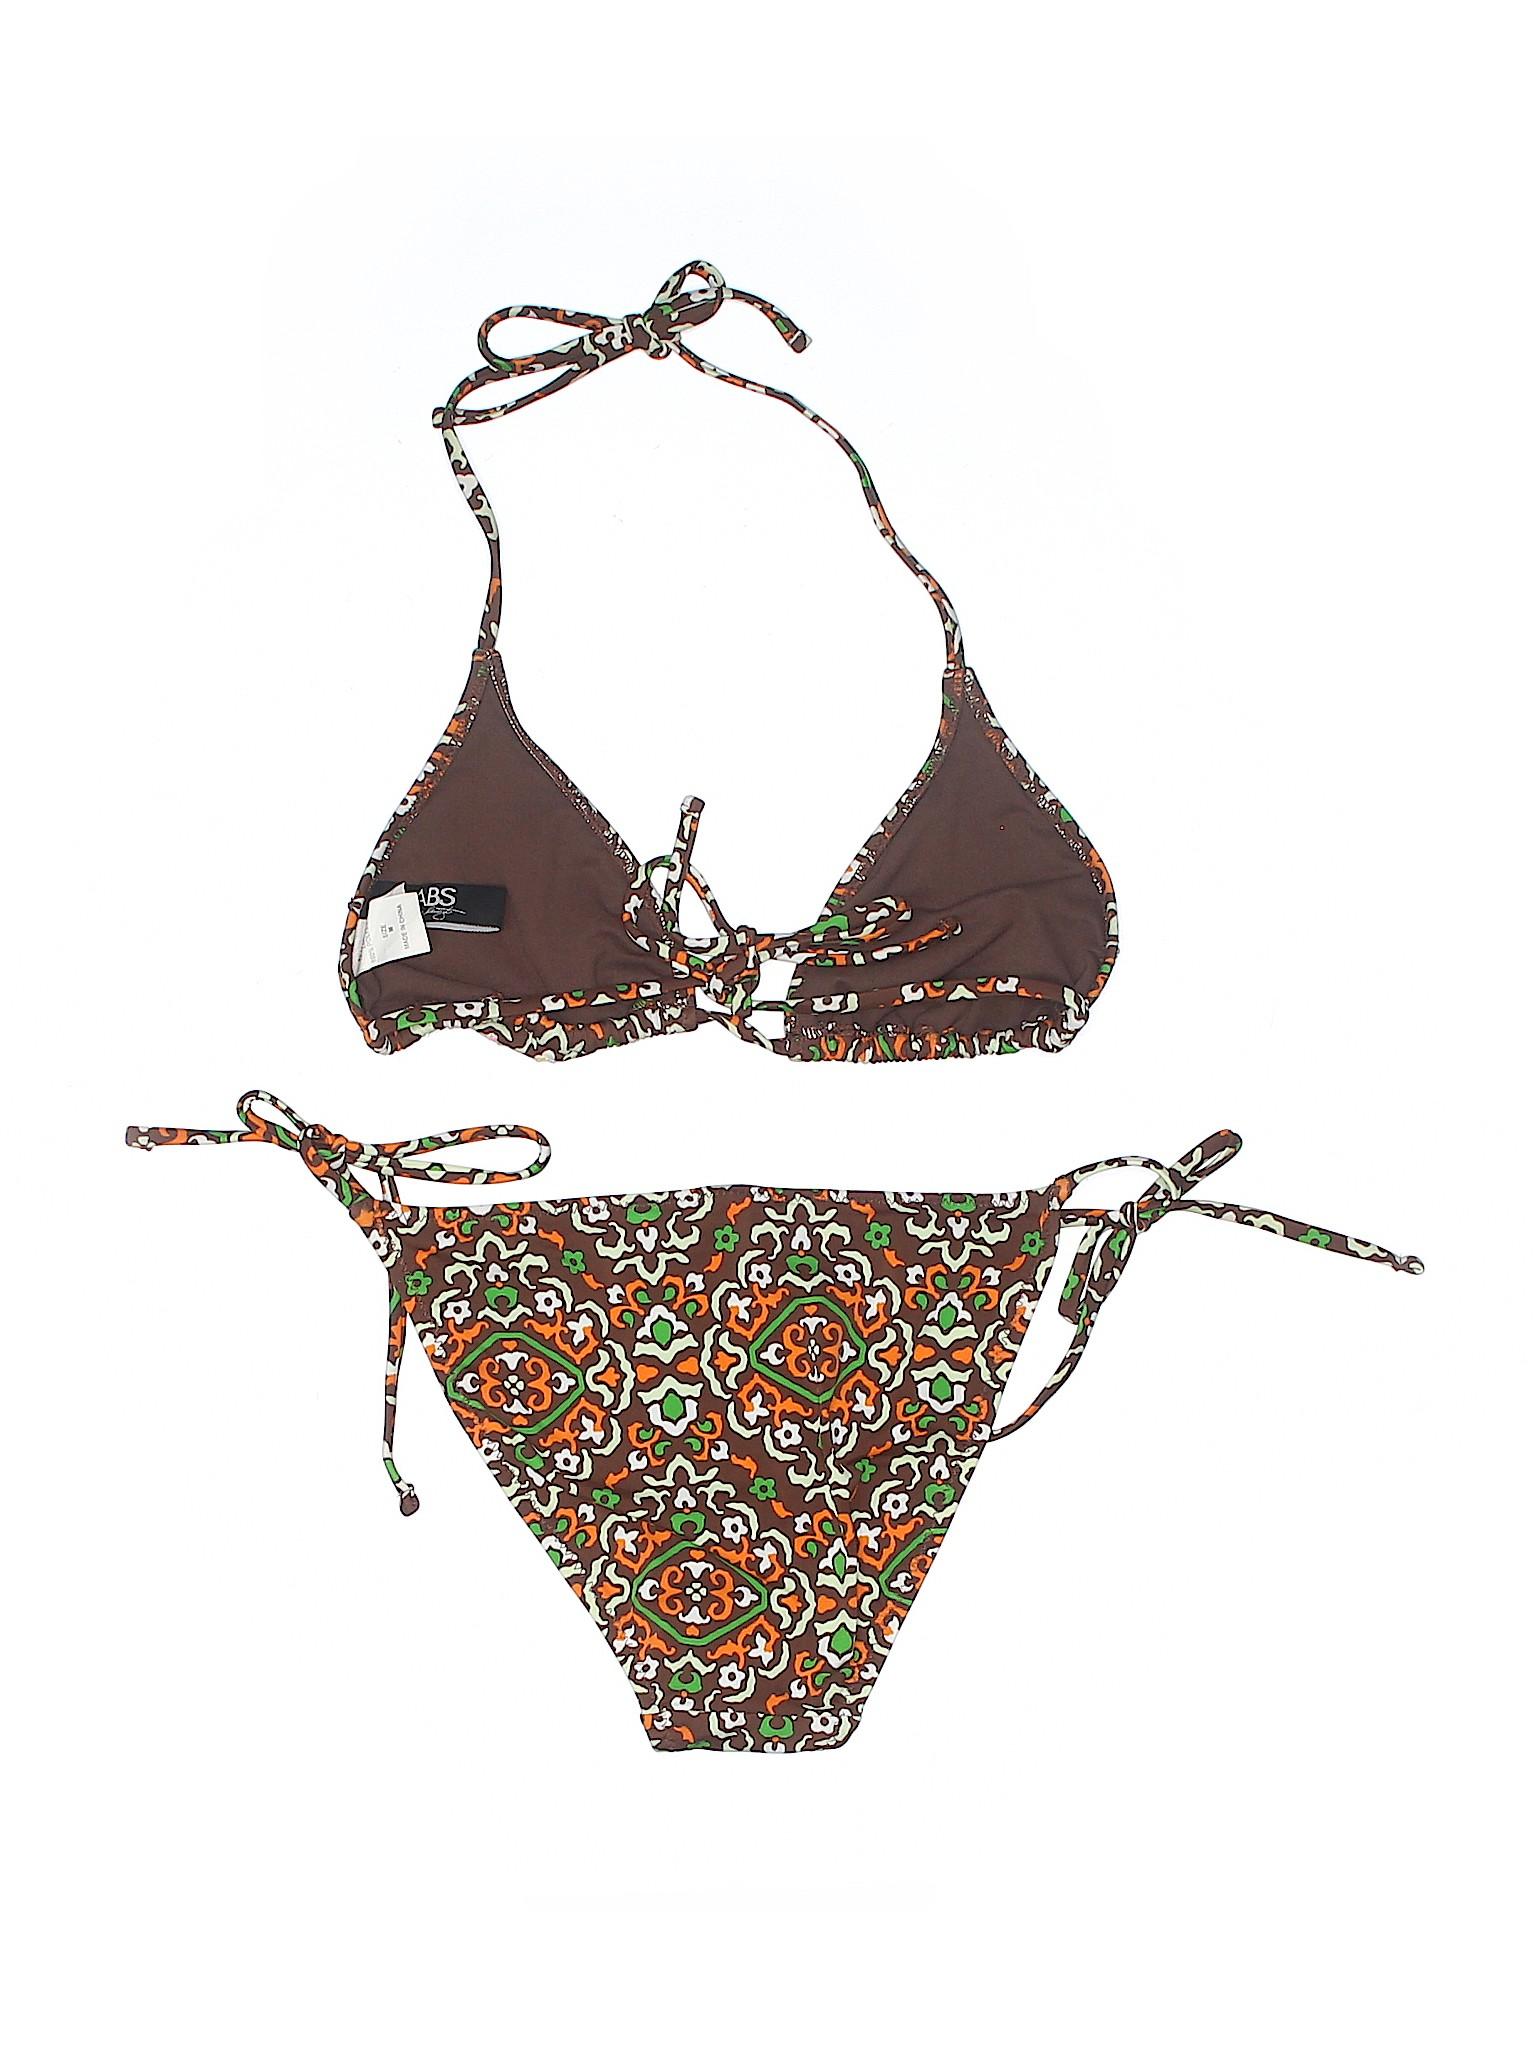 Boutique Allen ABS Piece Swimsuit Two Schwartz rrpgqw8